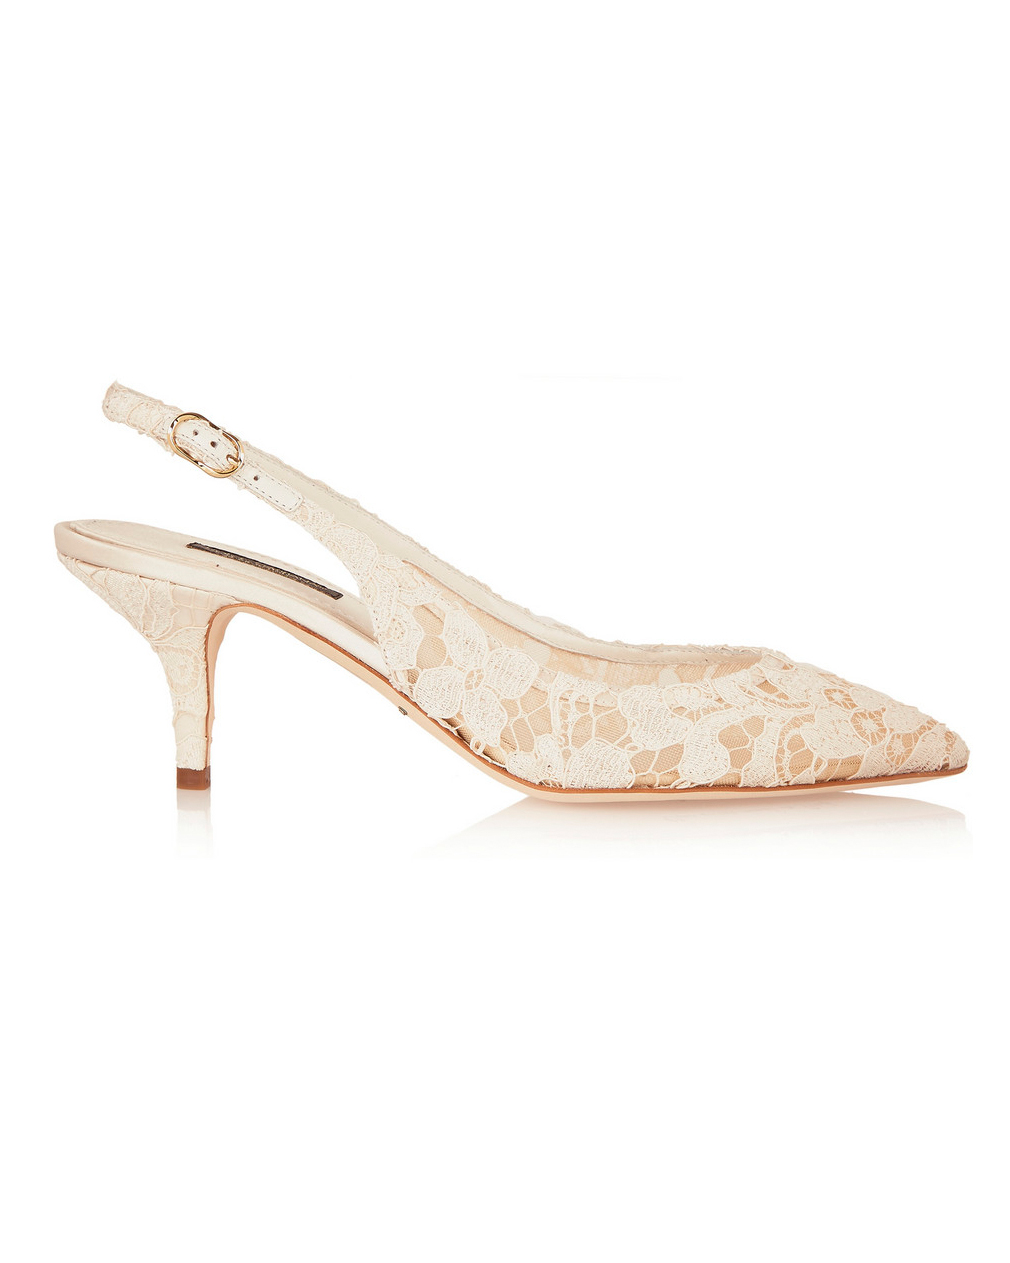 fall-wedding-shoes-dolce-gabbana-lace-0914.jpg